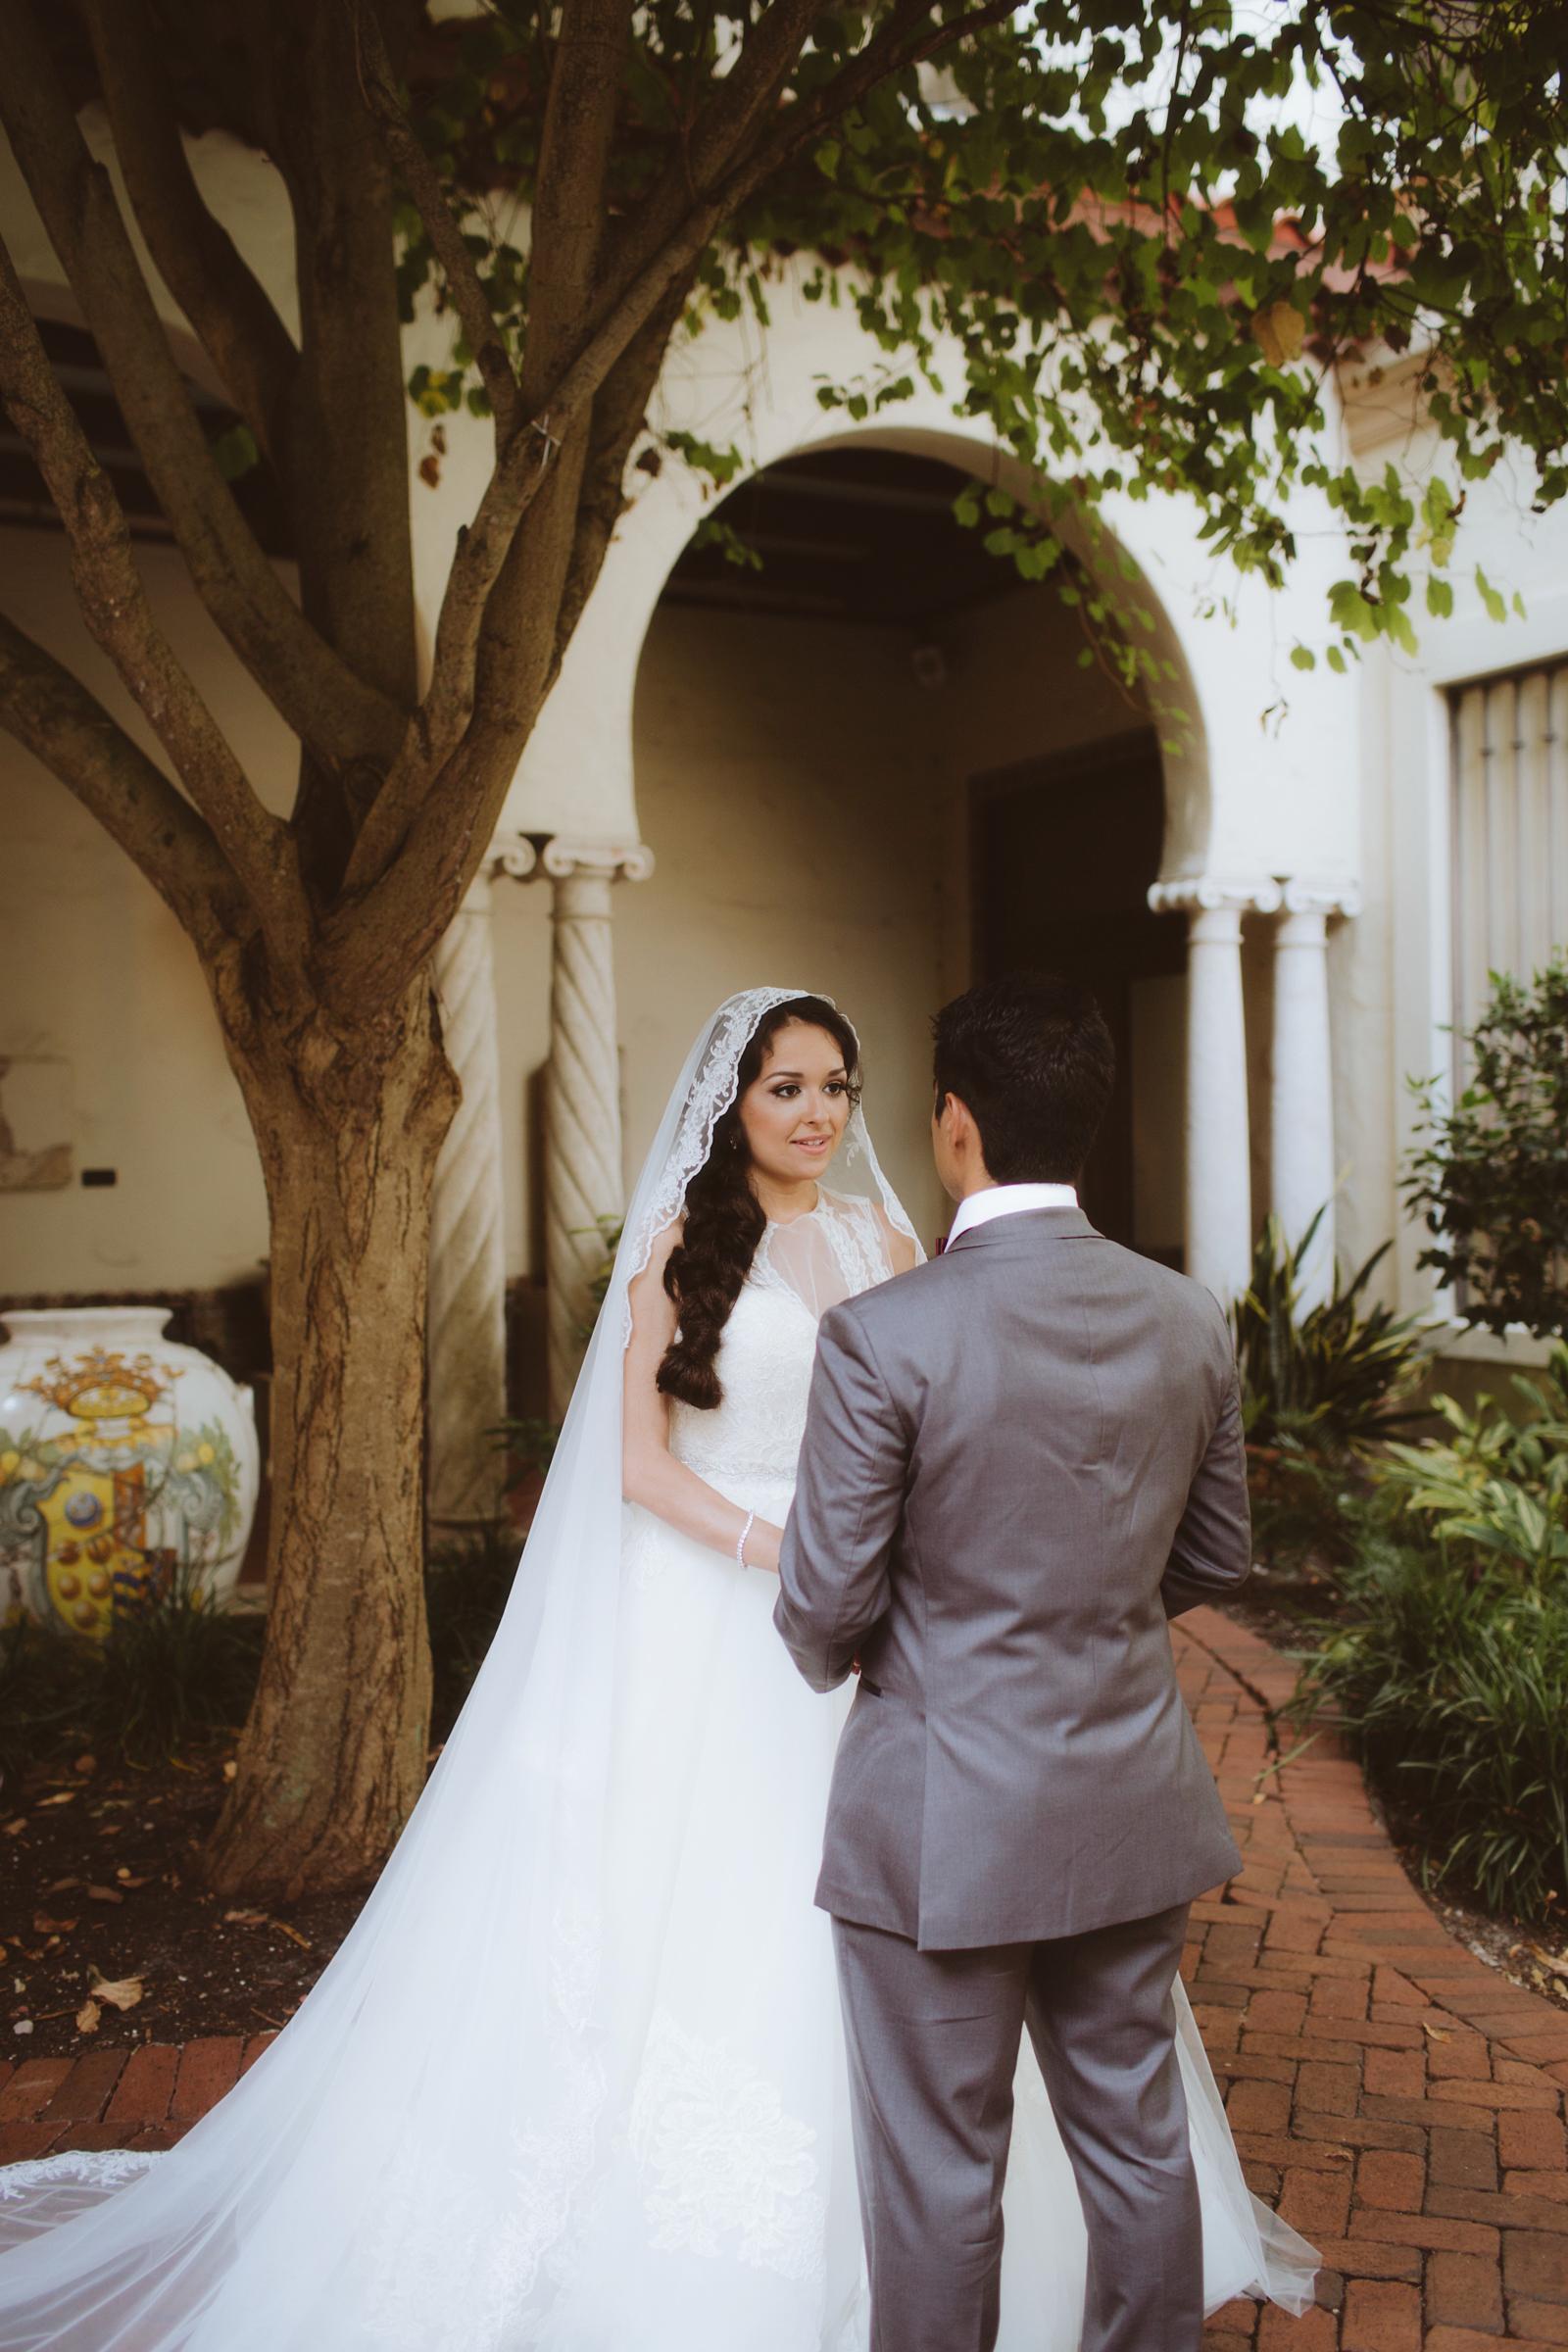 wedding day | MFA St Pete | Vanessa Boy Photography | vanessaboy.com